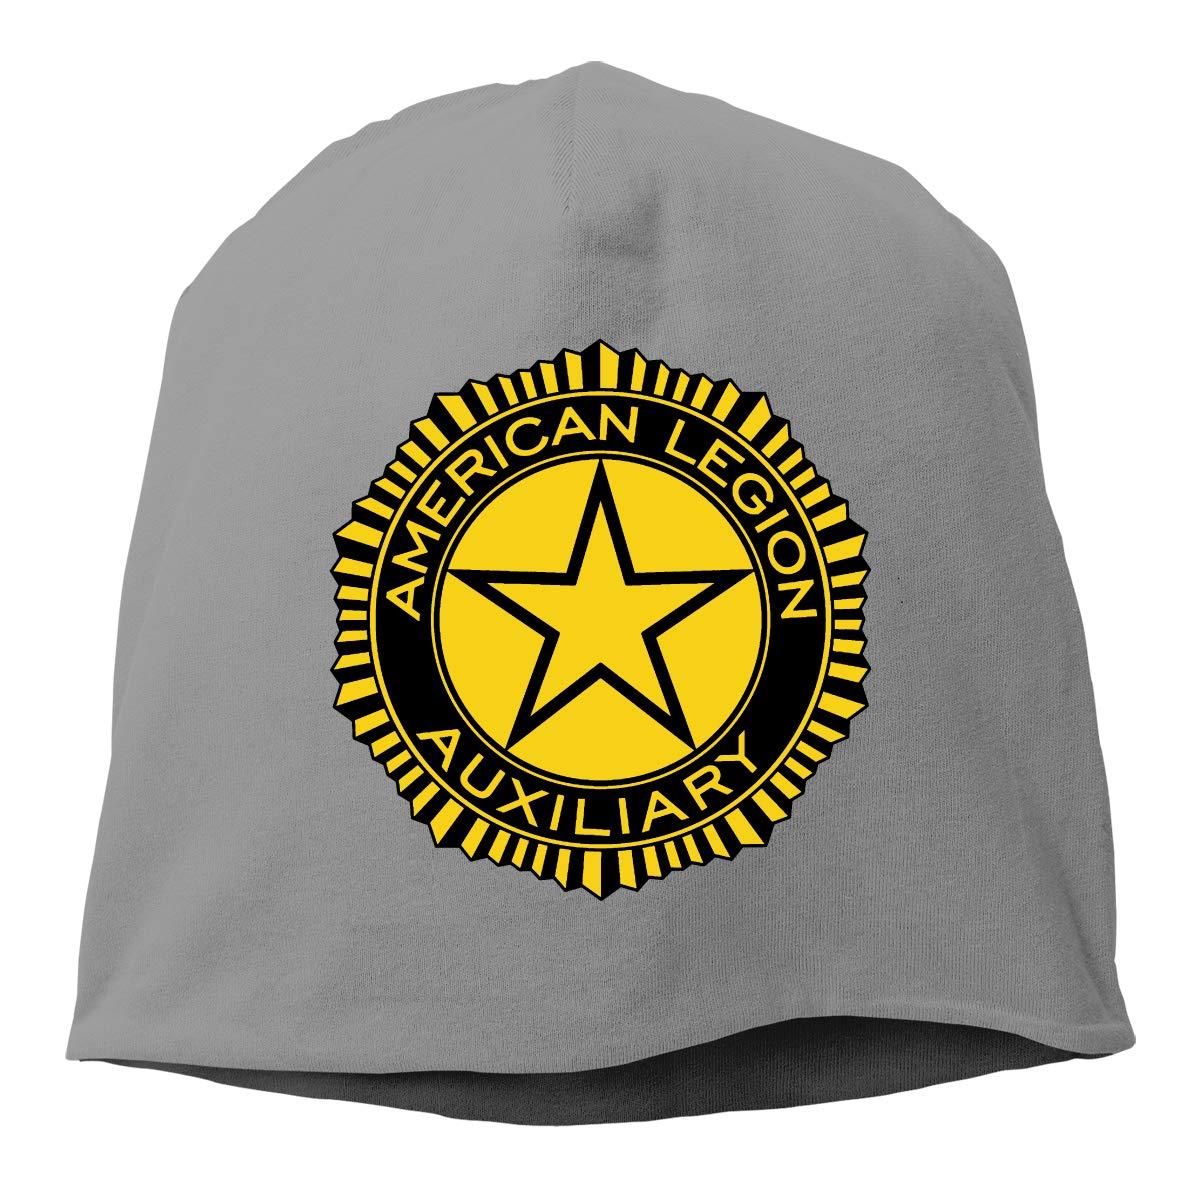 CRISCAP American Legion Auxiliary Helmet Liner Thin Skull Cap Beanie Hip Hop Cap